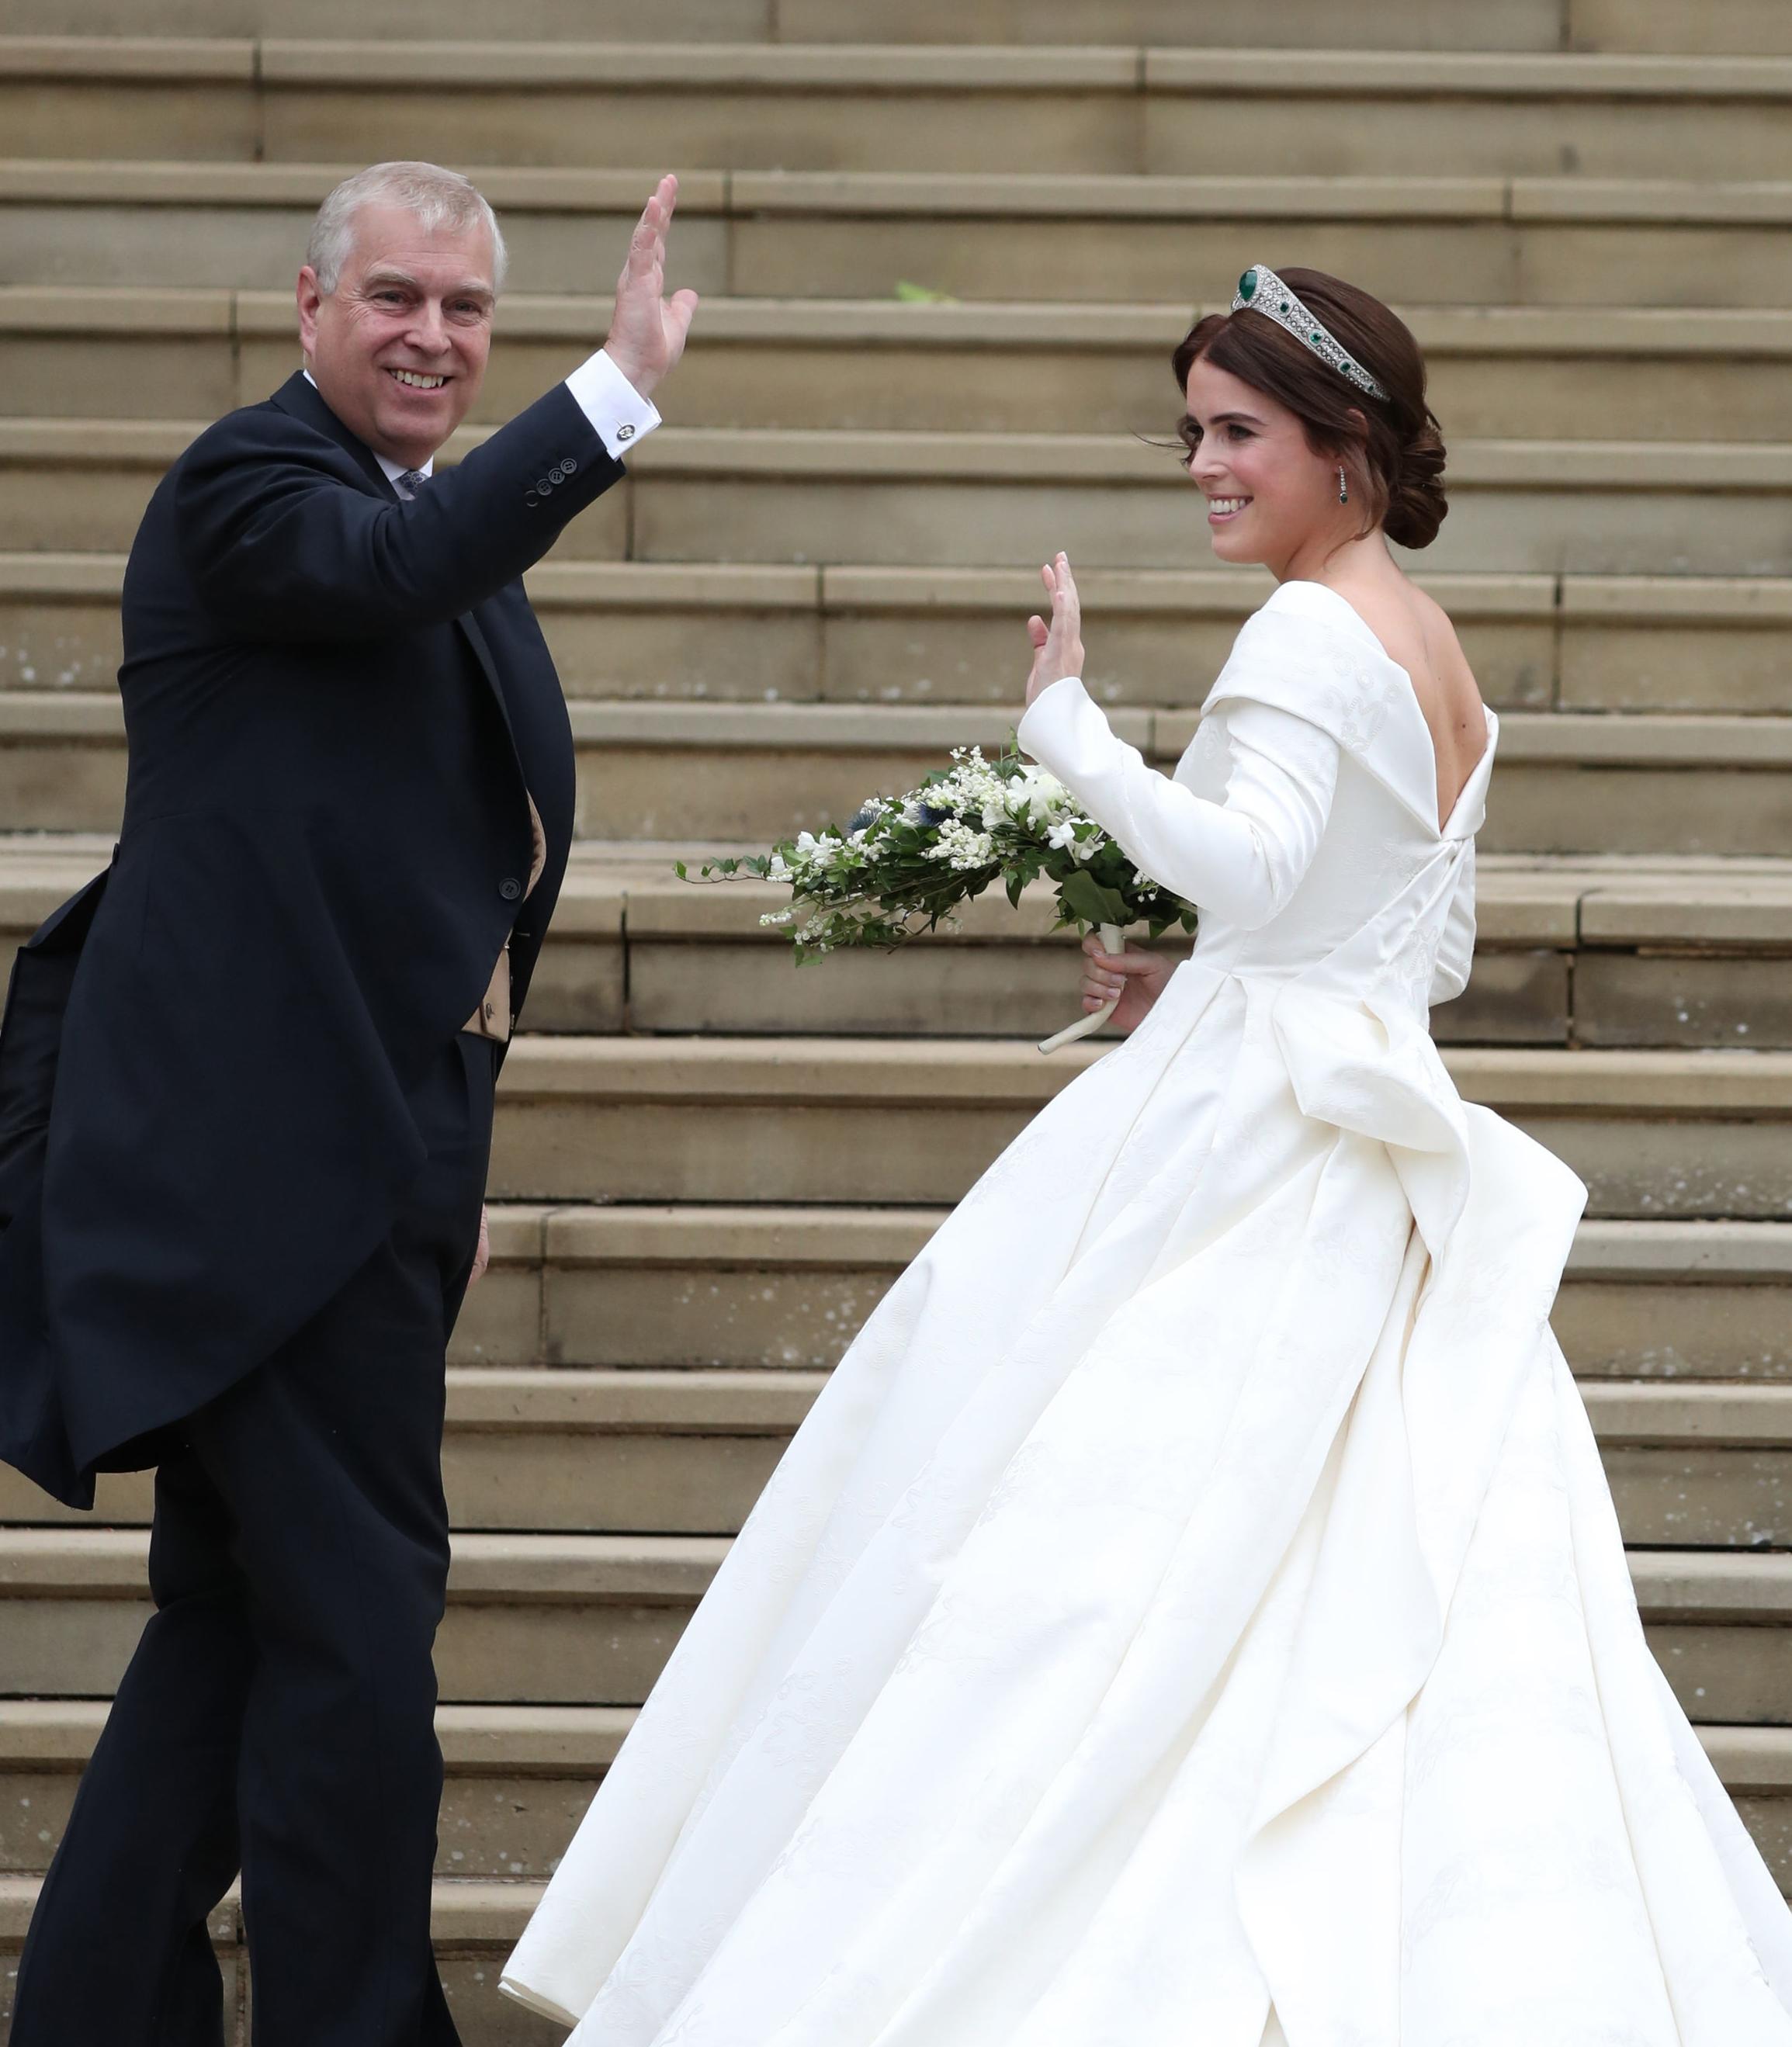 Sims 4 Wedding Dresses Maxis Match